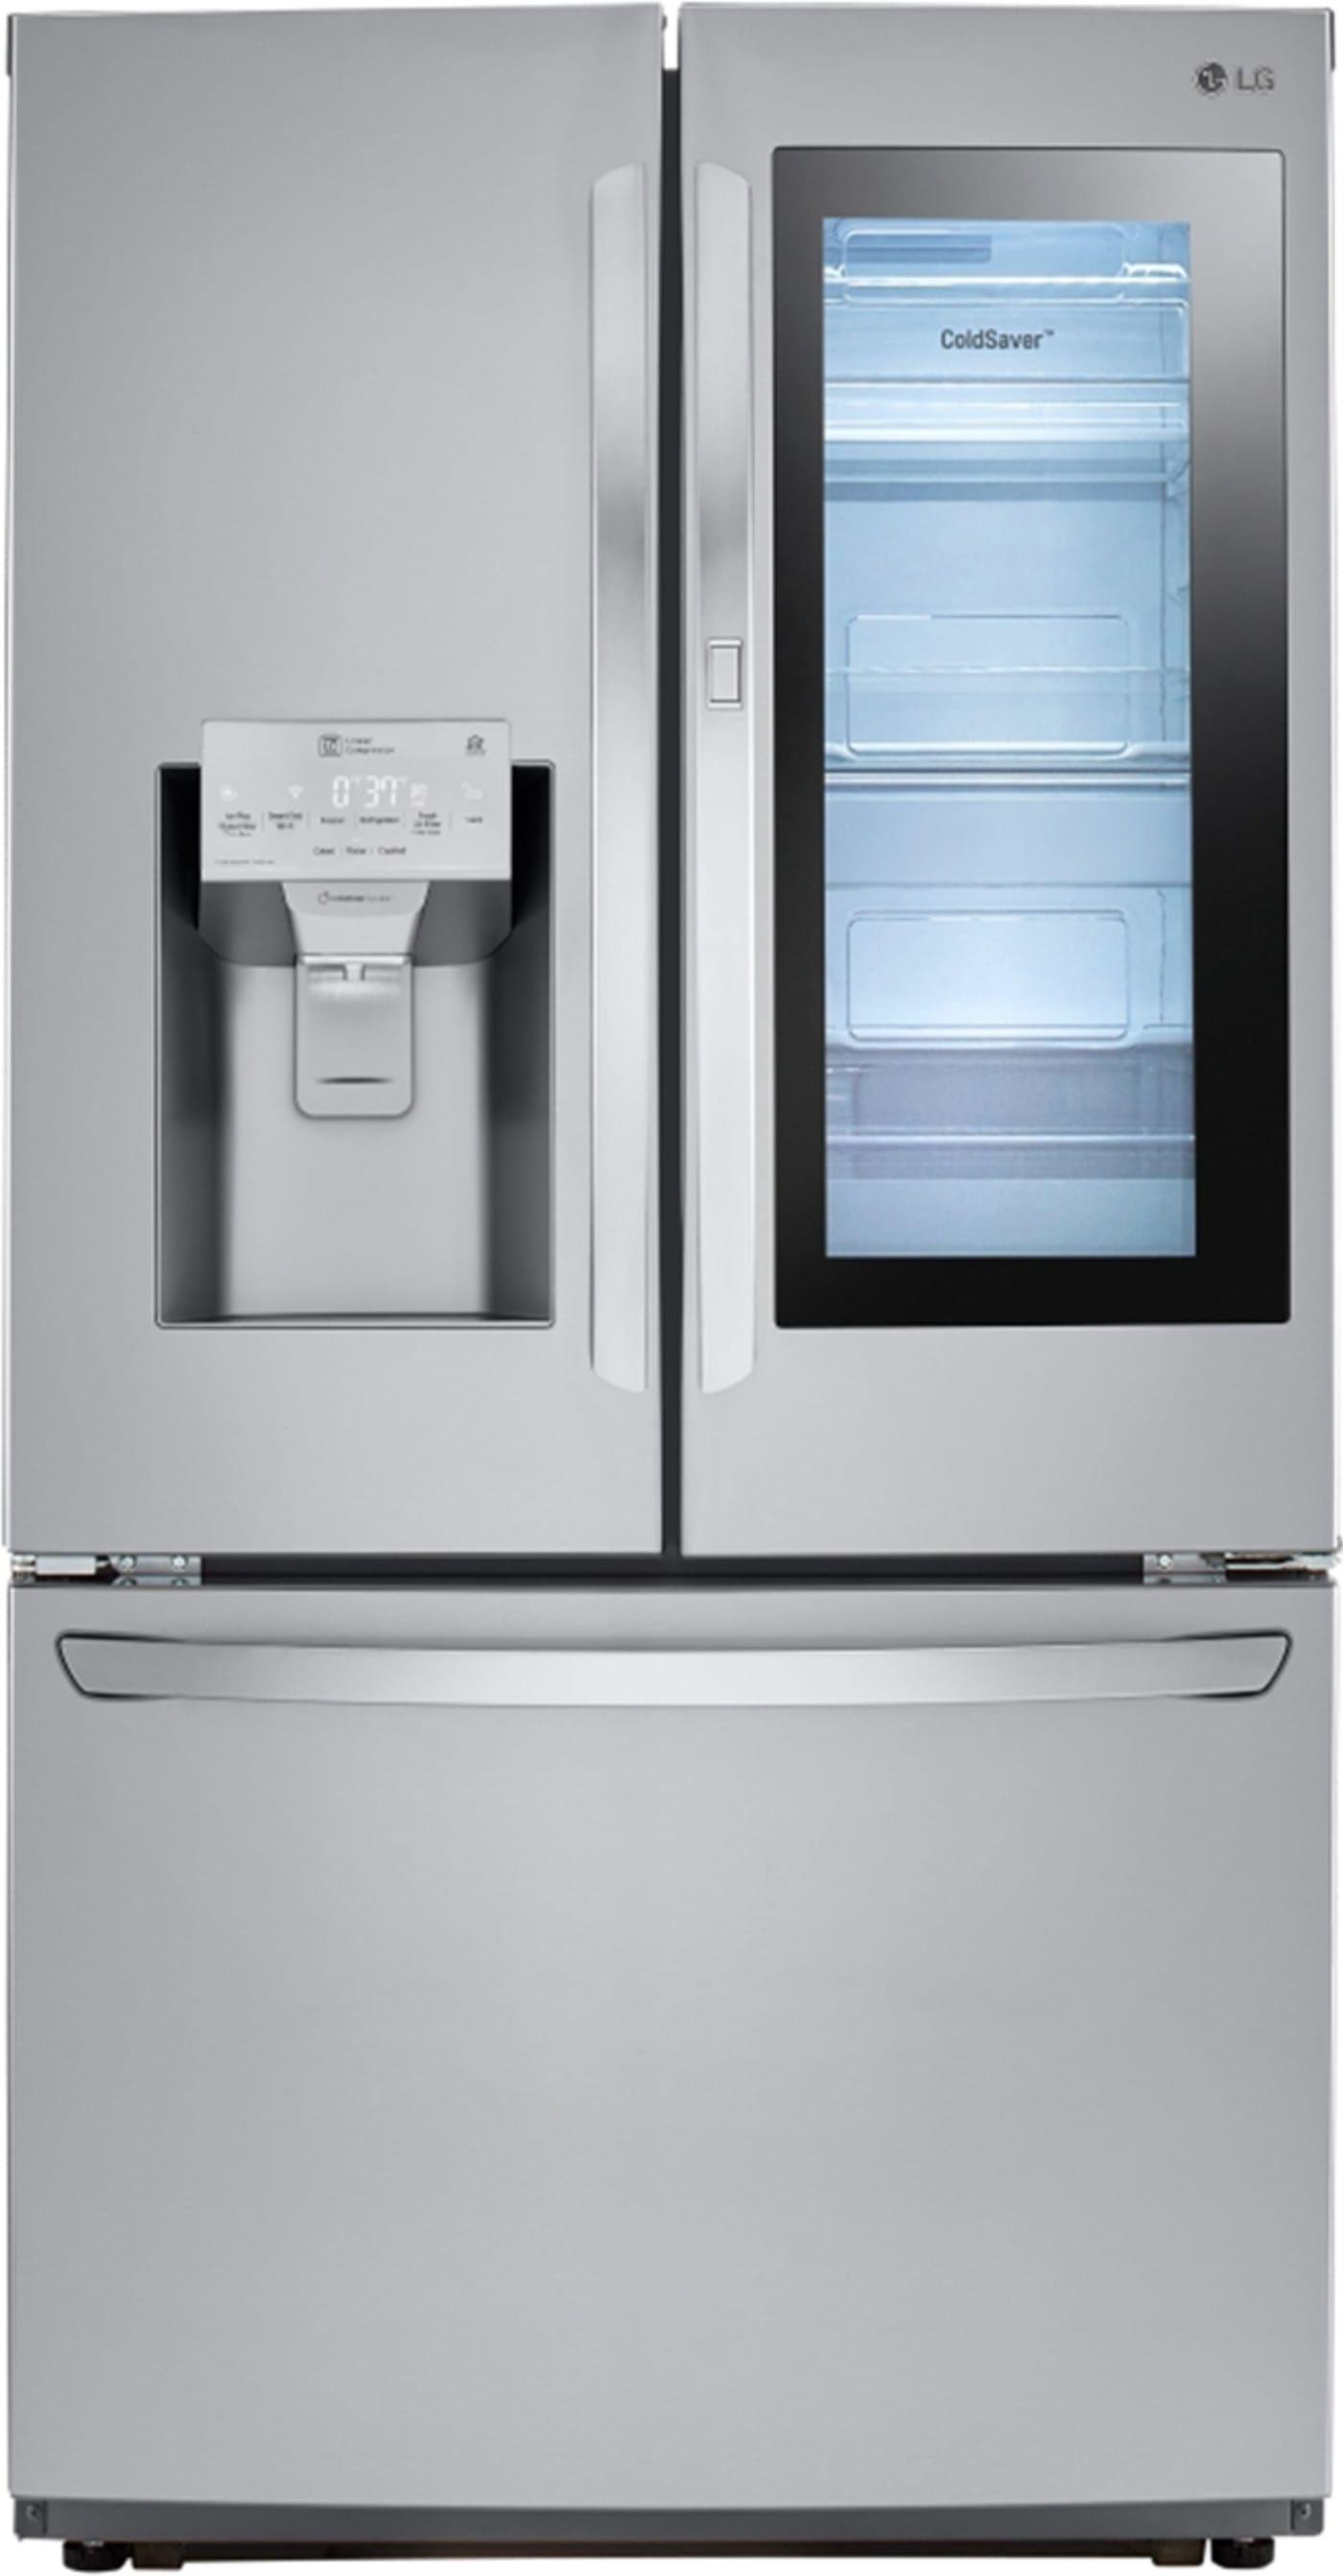 Lg Lfxs26596s Lg French Door Refrigerator Counter Depth French Door Refrigerator French Doors